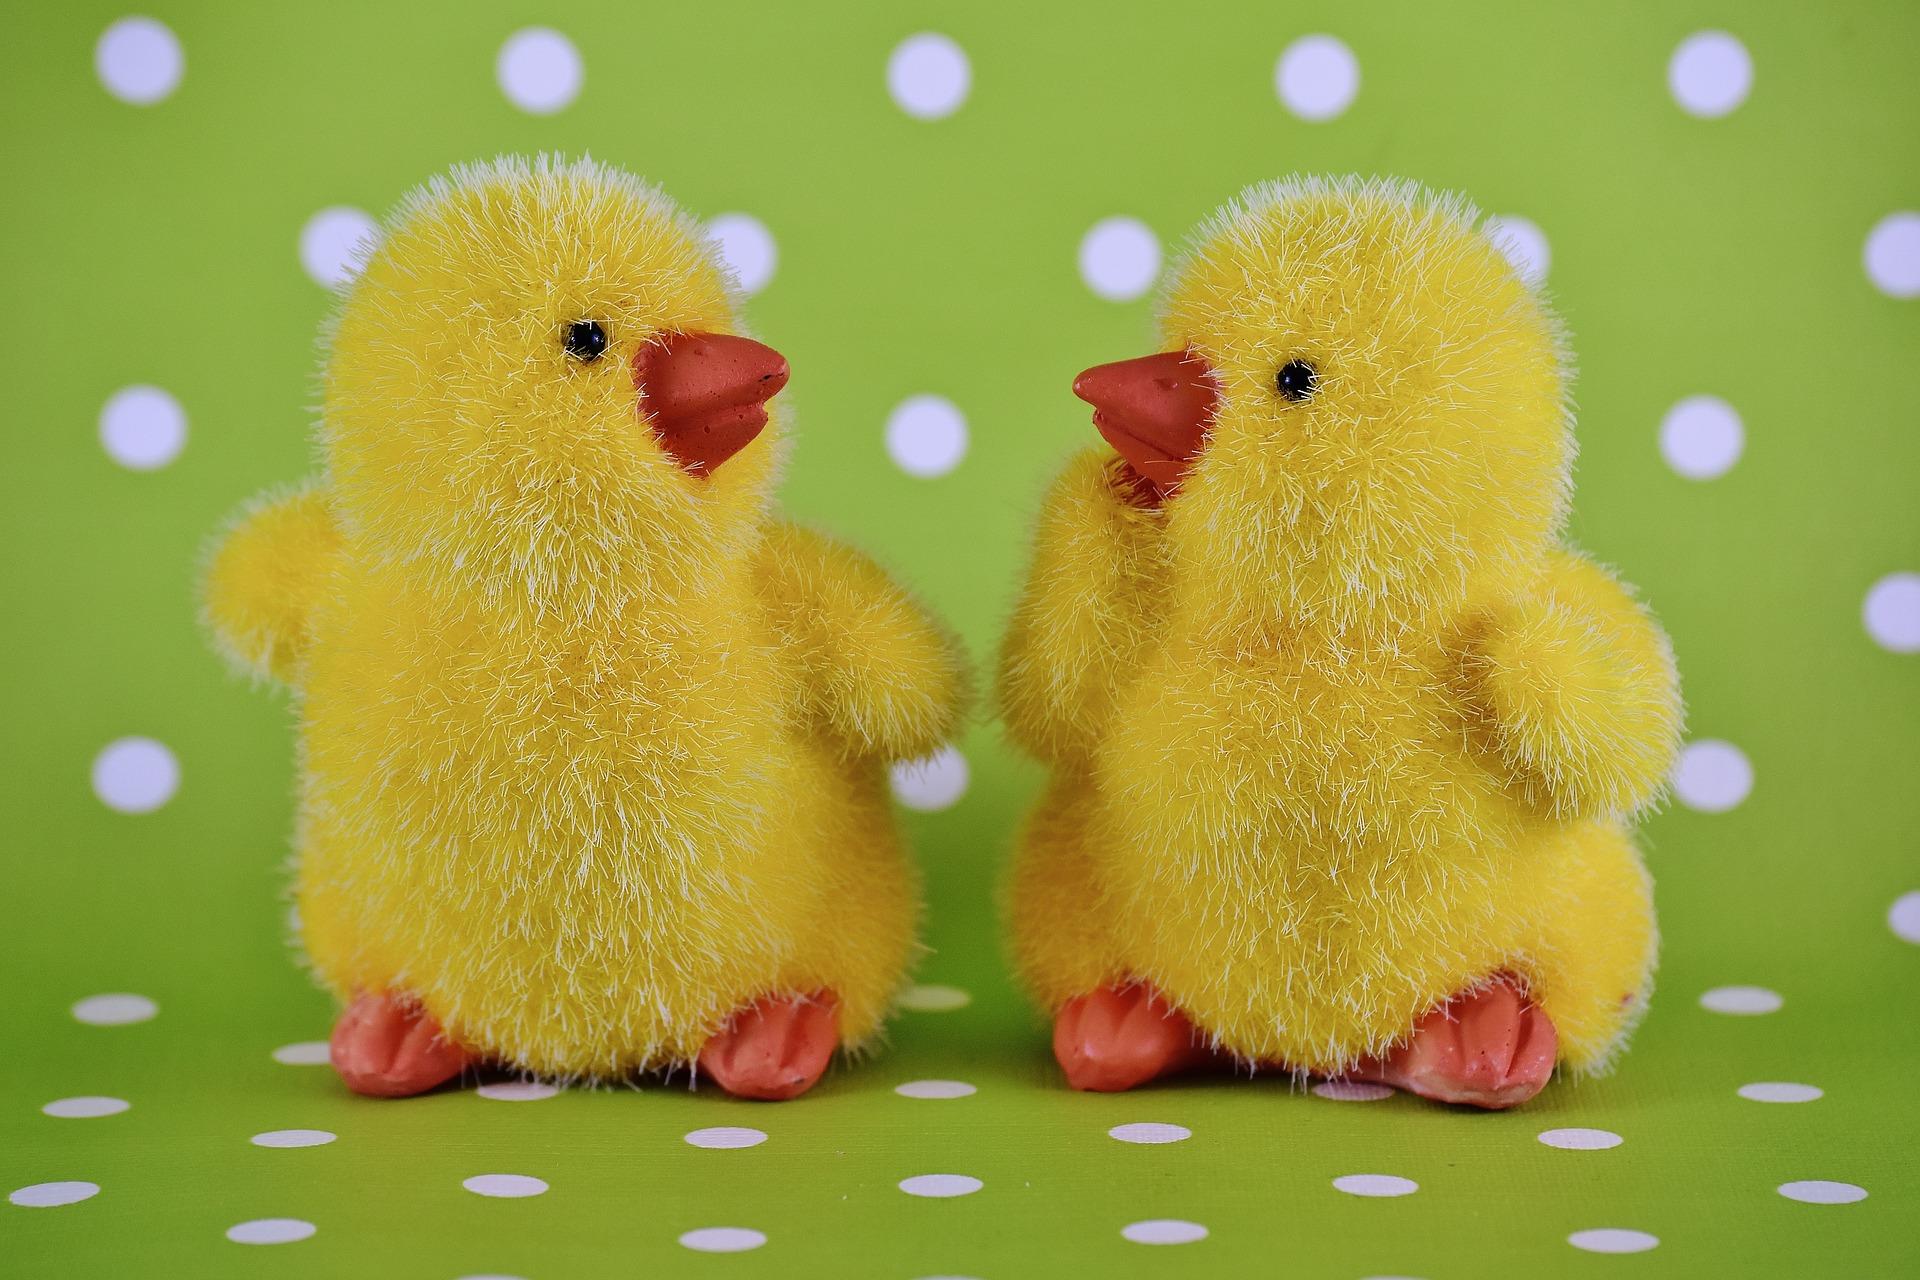 chicks-2093810_1920